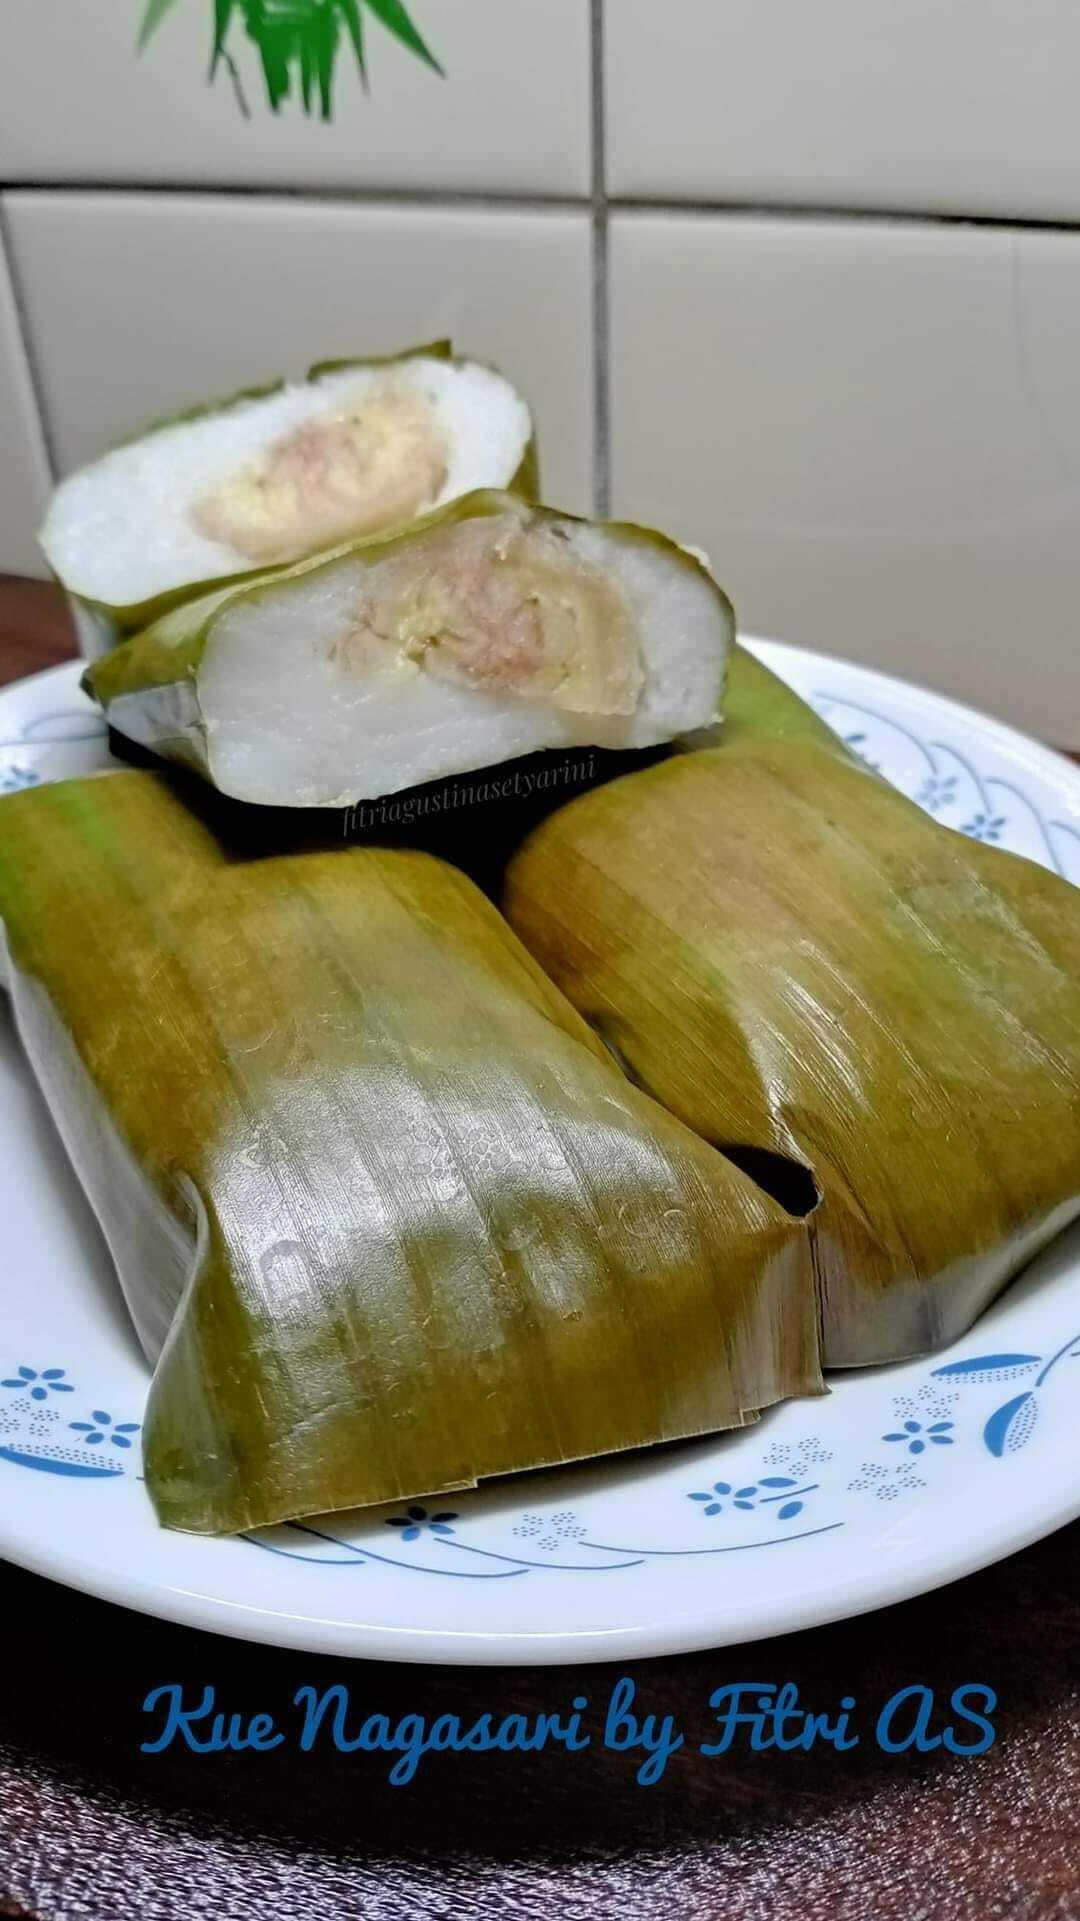 snack jadul NAGASARI by Fitri Agustina Setyarini